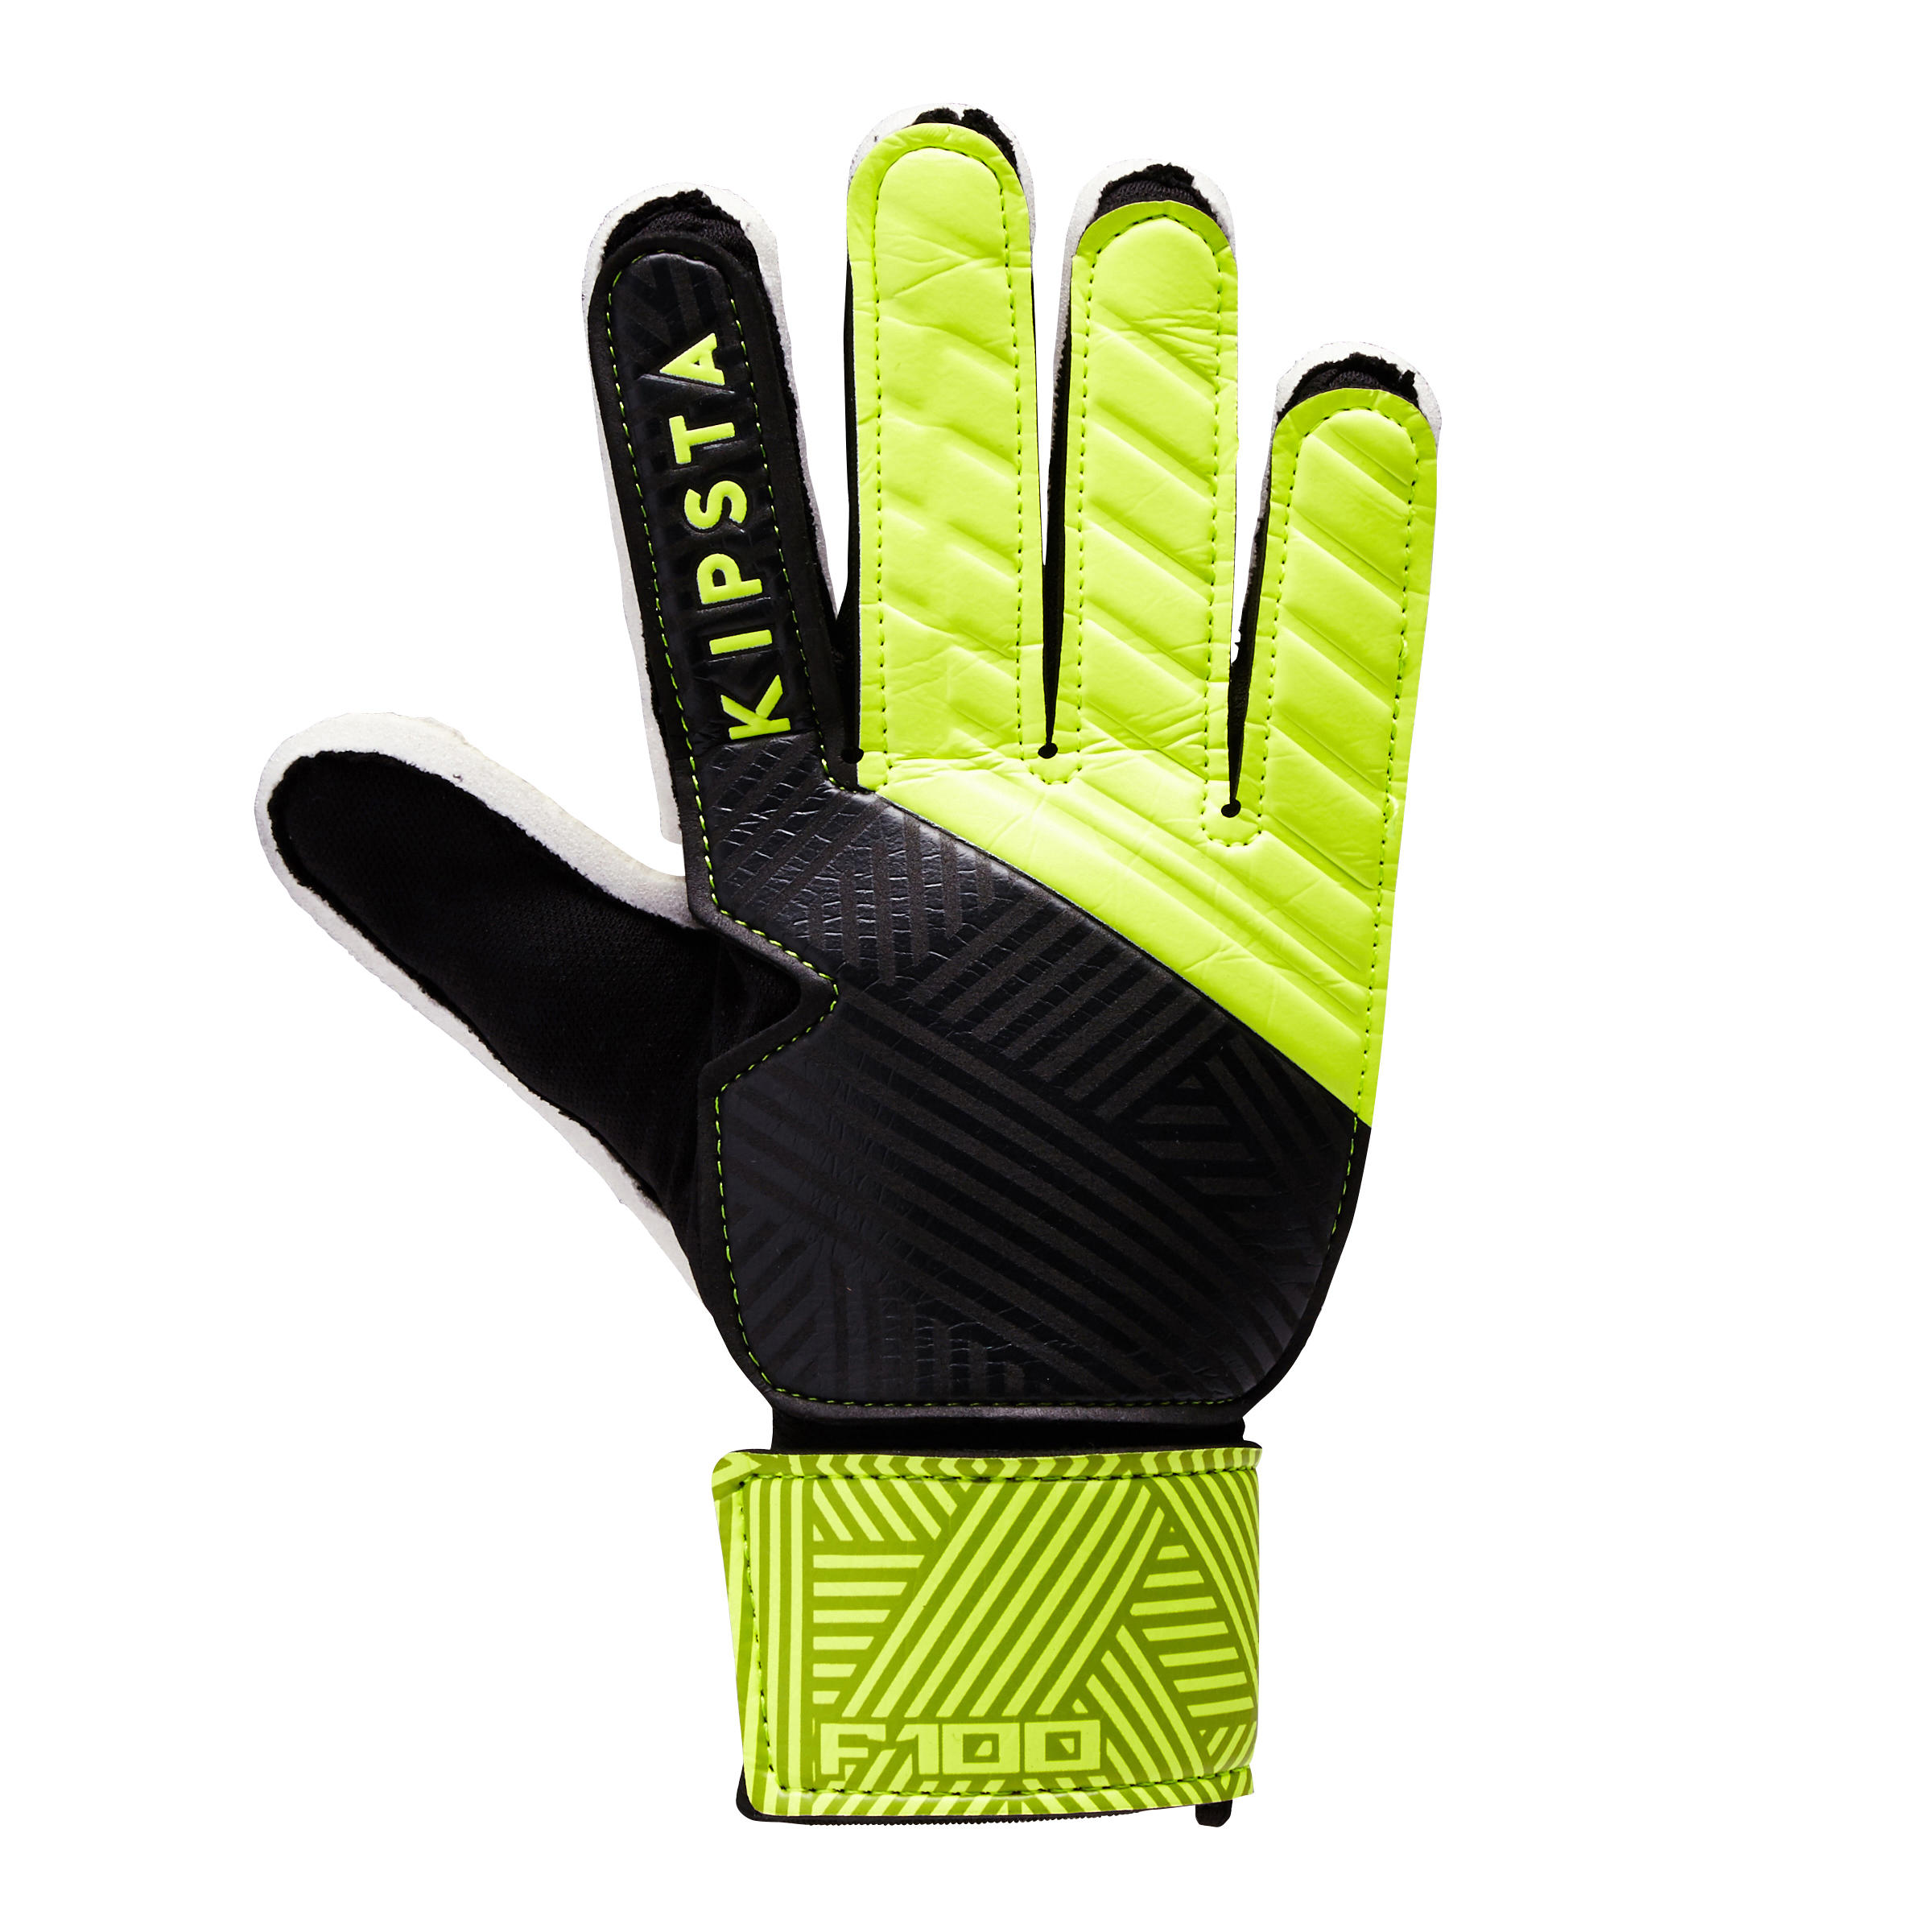 Sarung Tangan Penjaga Gawang Sepak Bola F100 Dewasa - Hitam Kuning